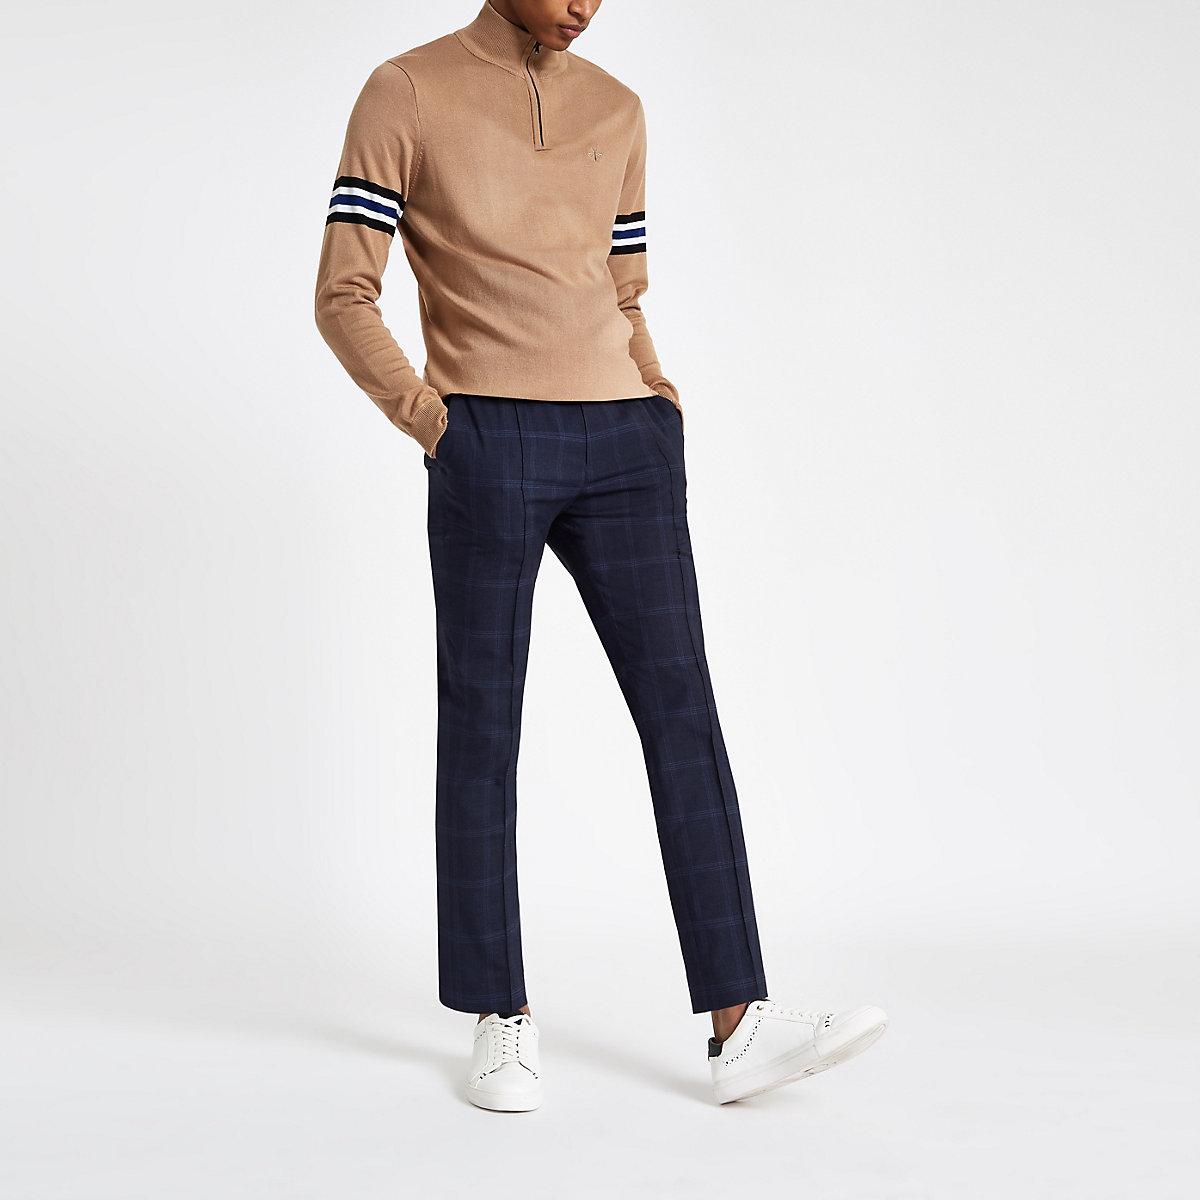 Pantalon de jogging skinny habillé à carreaux bleu marine